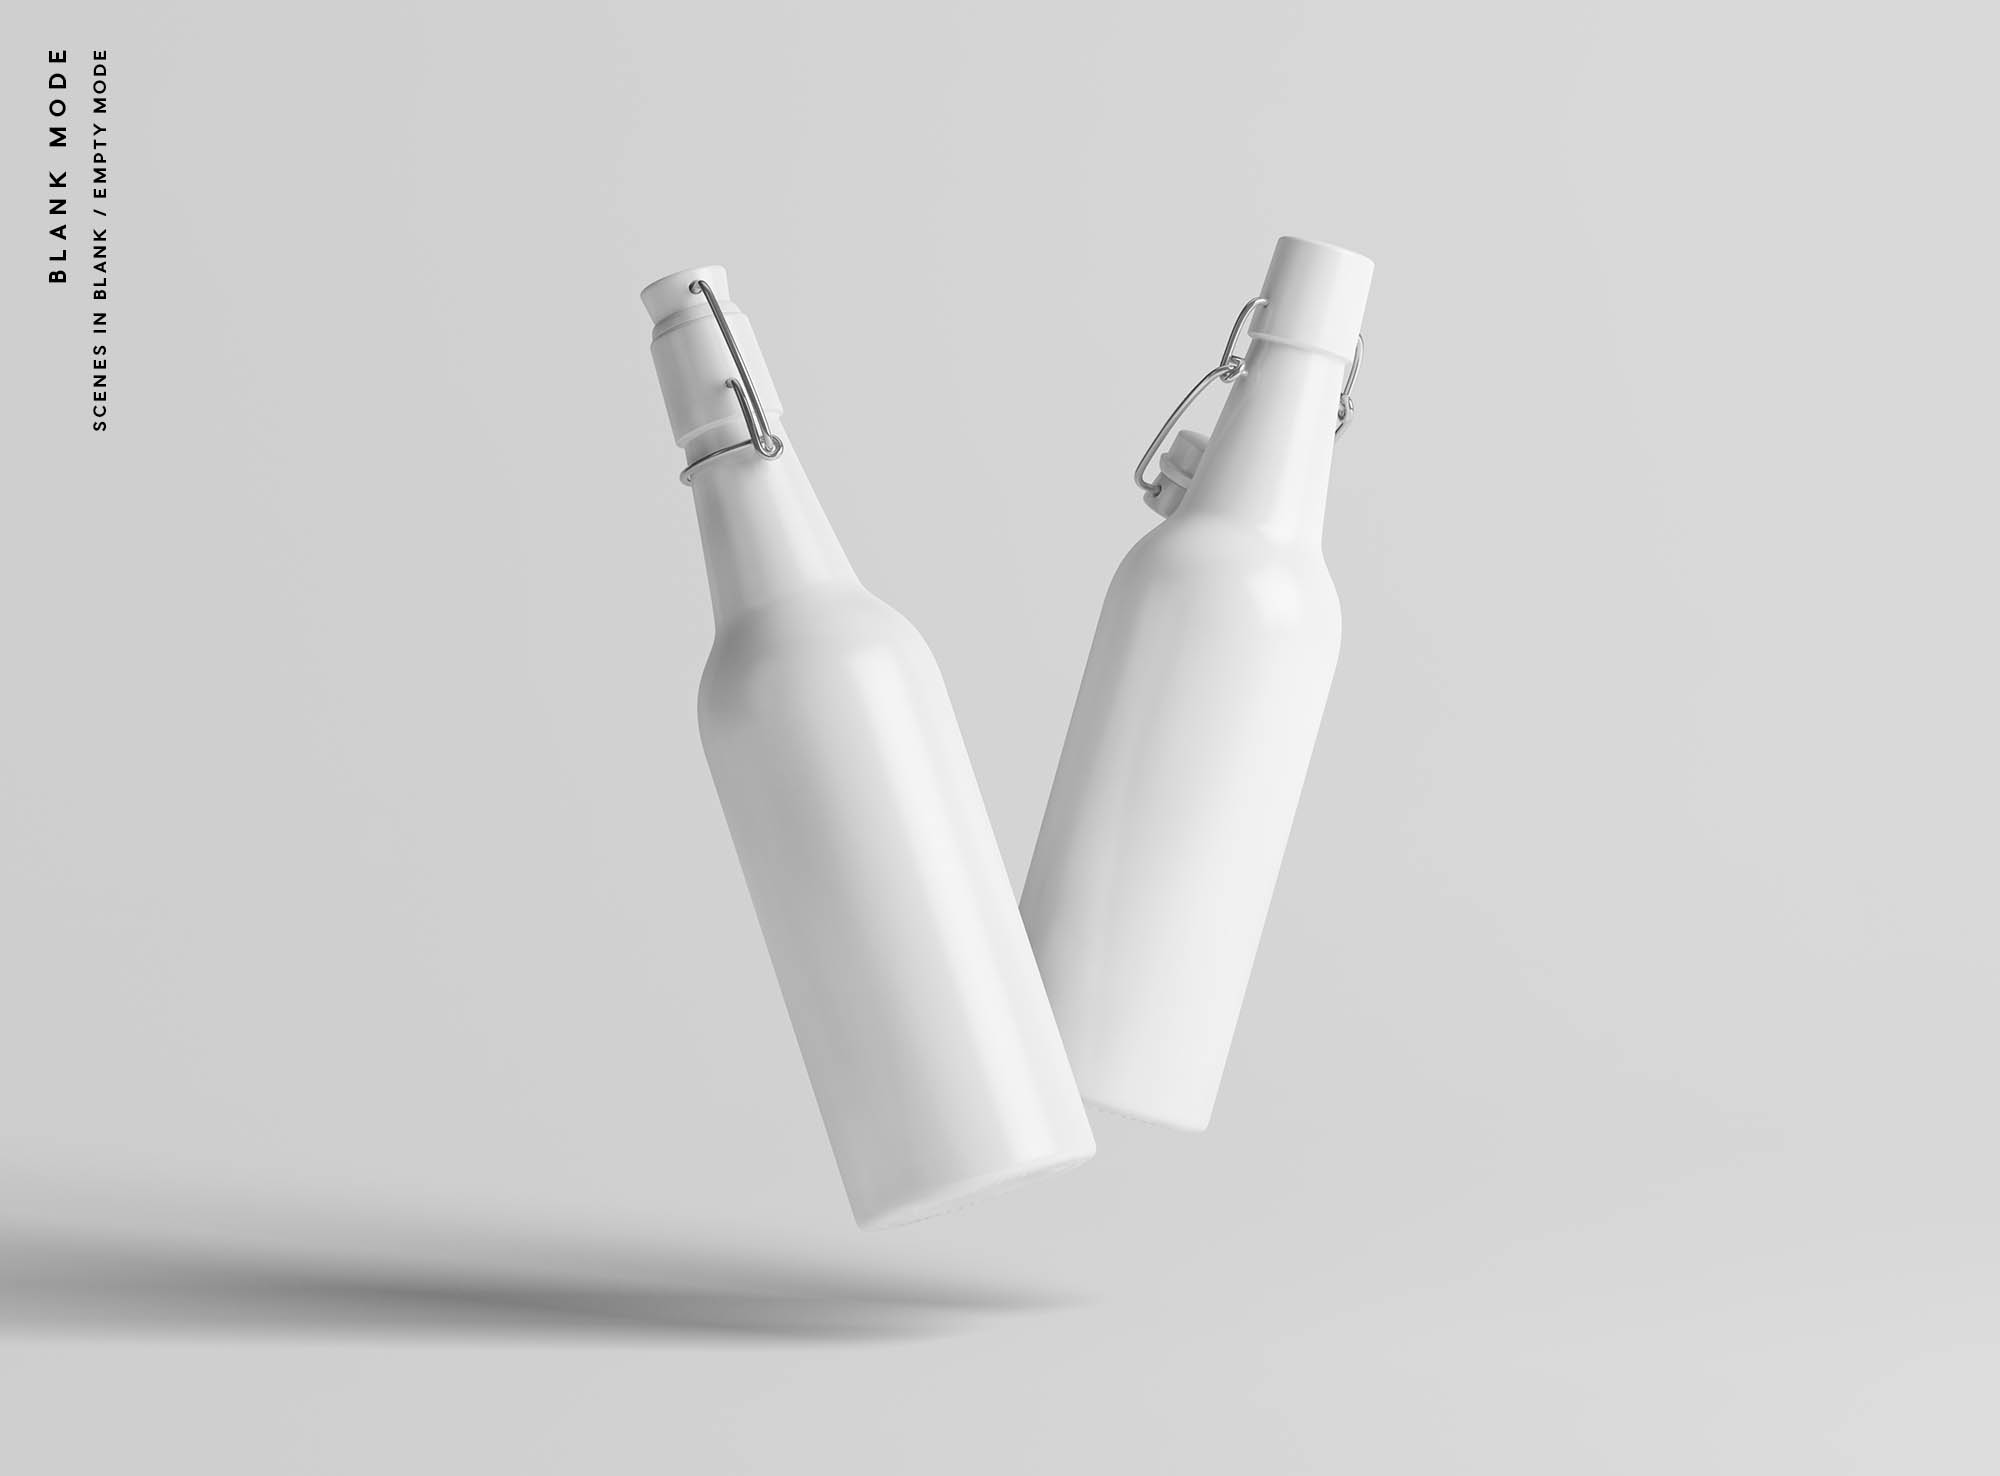 Matt Bottles Mockup - Blank